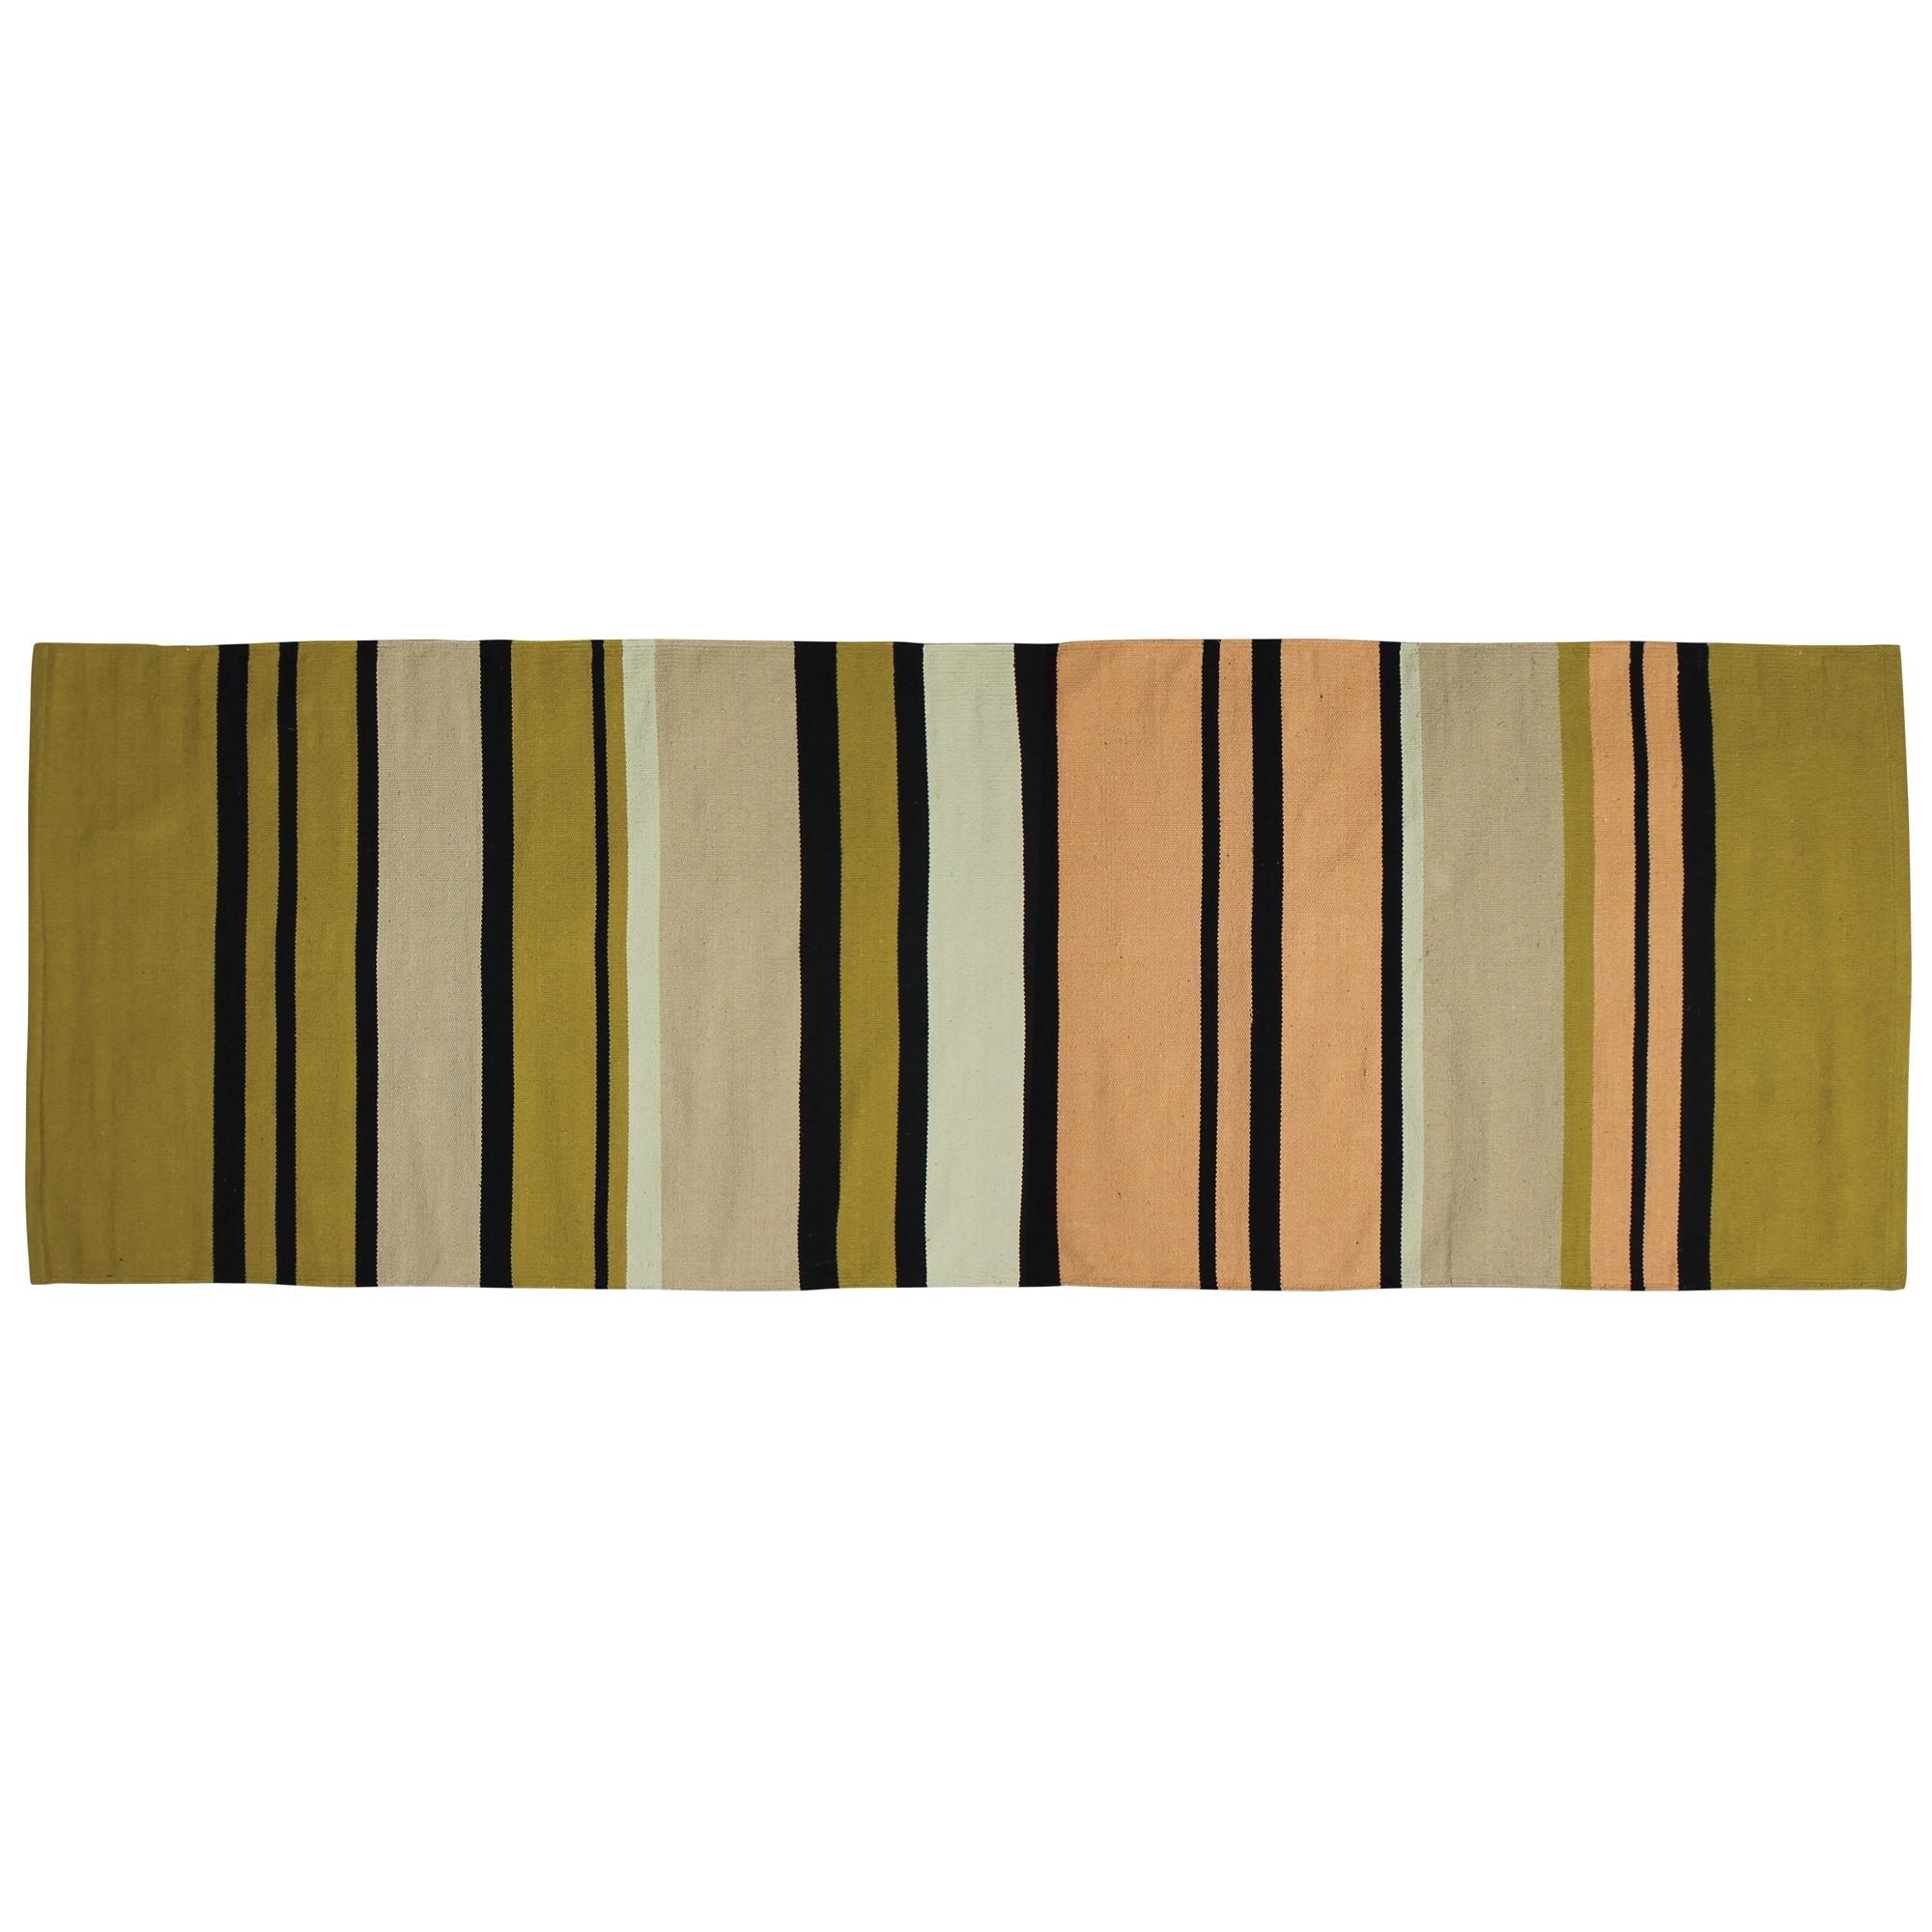 3' X 8' Multicolored Stripes Runner Rug